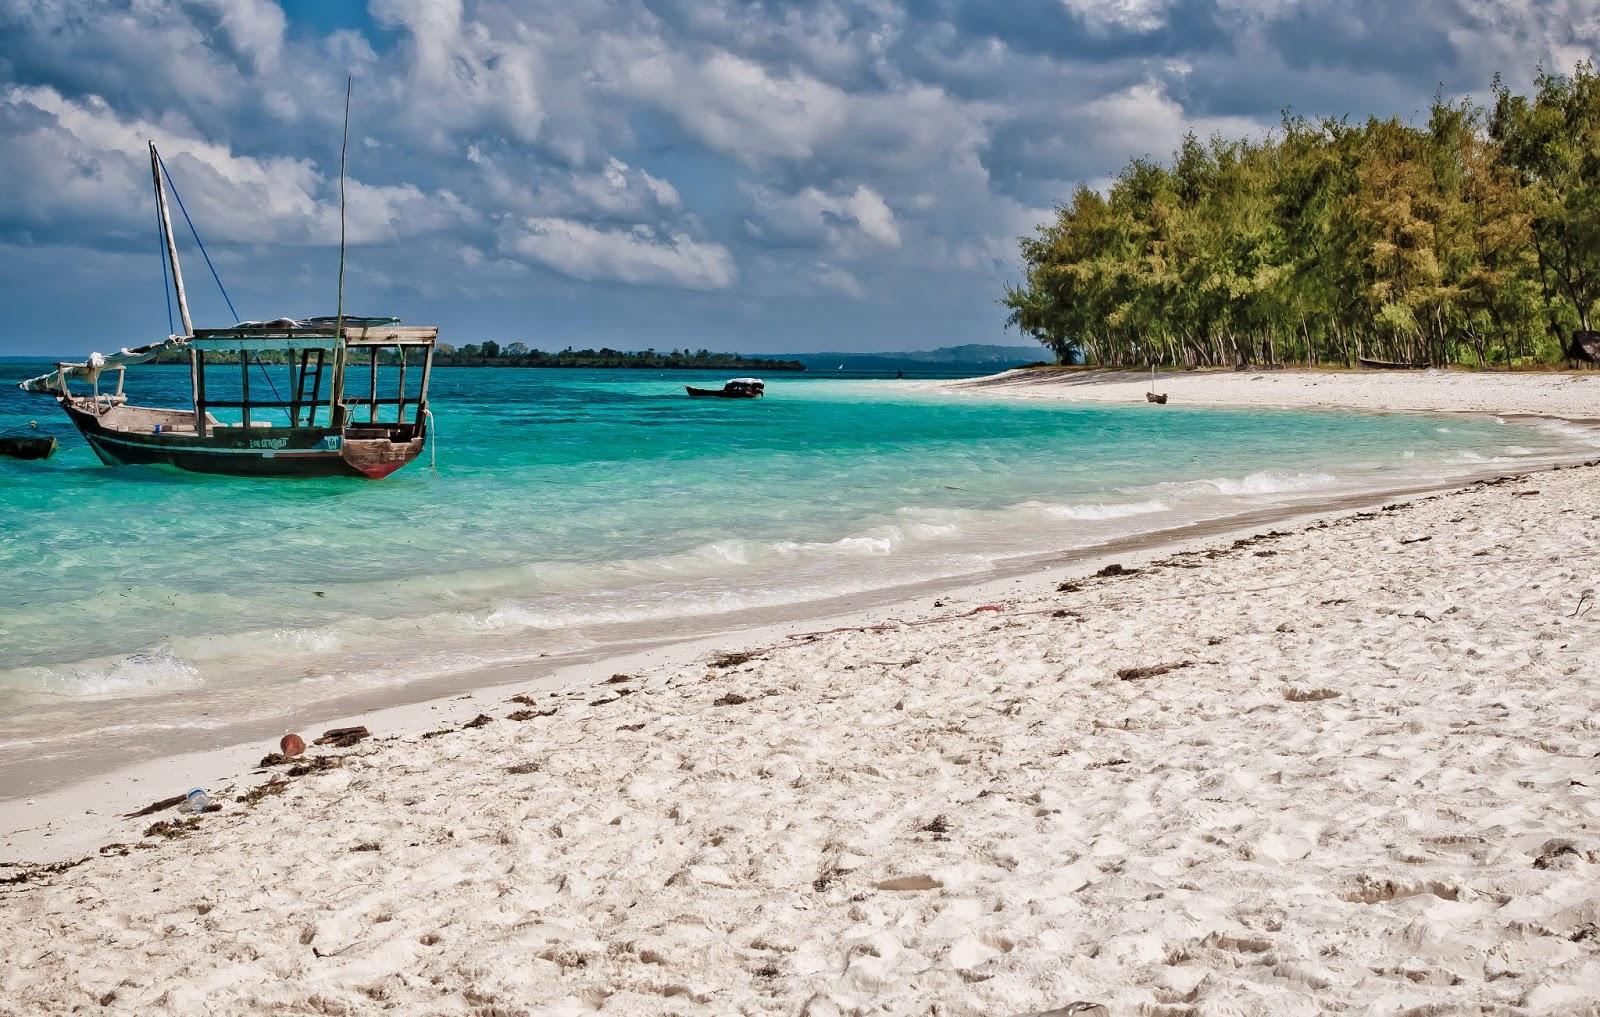 L'incantevole spiaggia cristallina di Nungwi, a Zanzibar